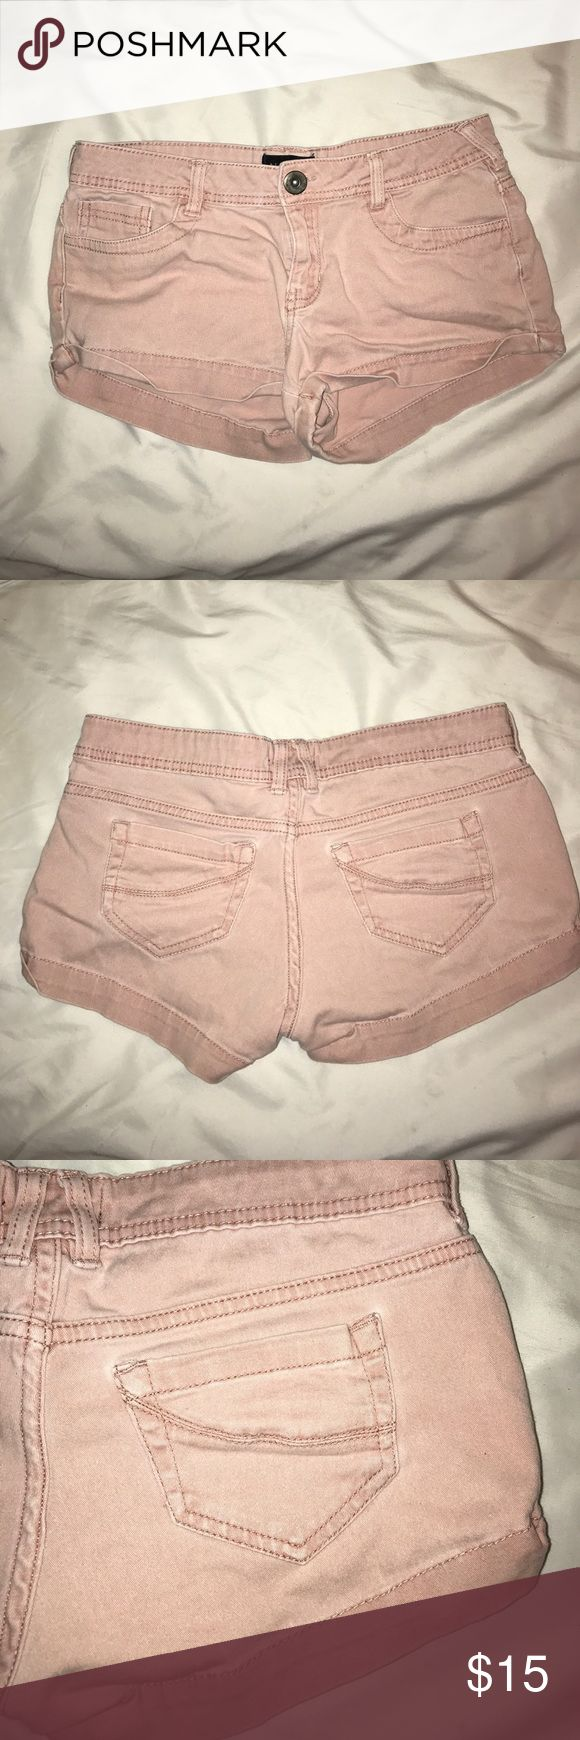 Dusty rose shorts New Look Dusty Rose shorts size 5 New Look Shorts